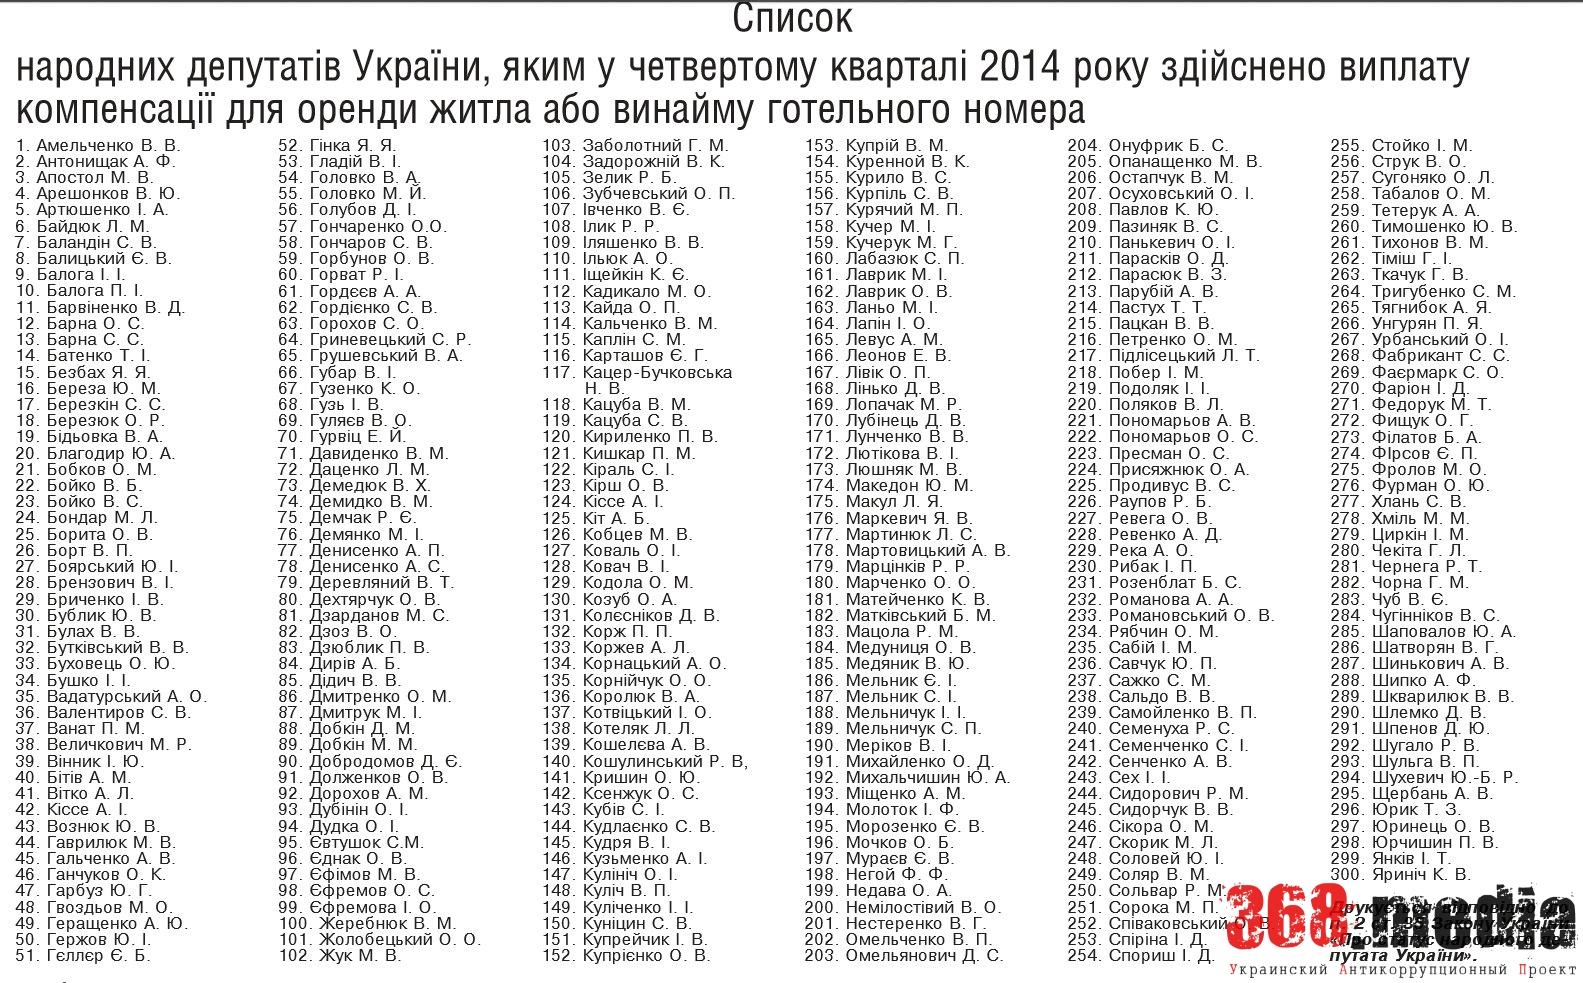 Список нуждающихся. Фото: kievnews.glavcom.ua